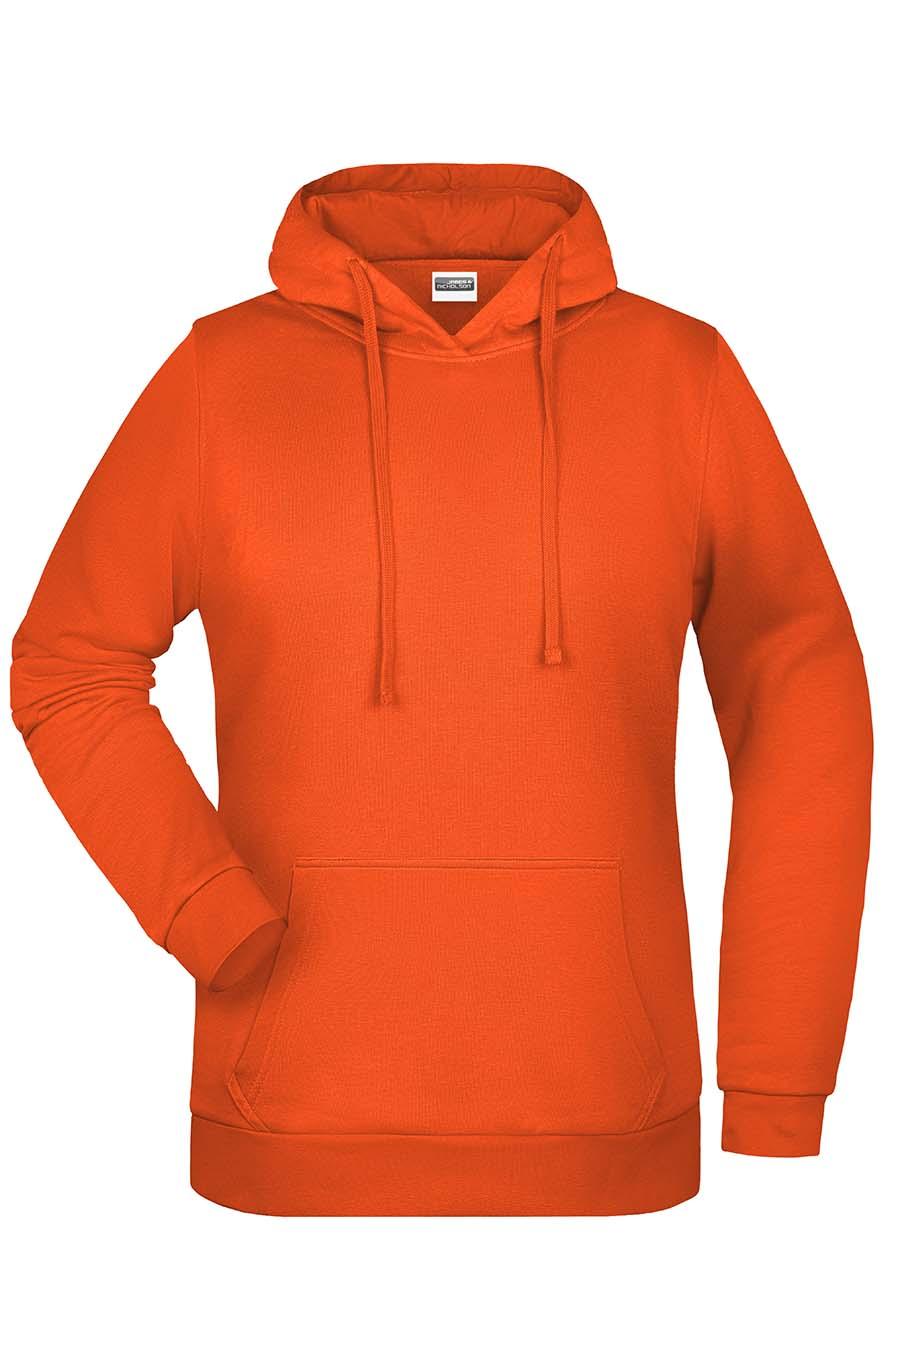 Sweat-shirt capuche femme - 20-1494-14